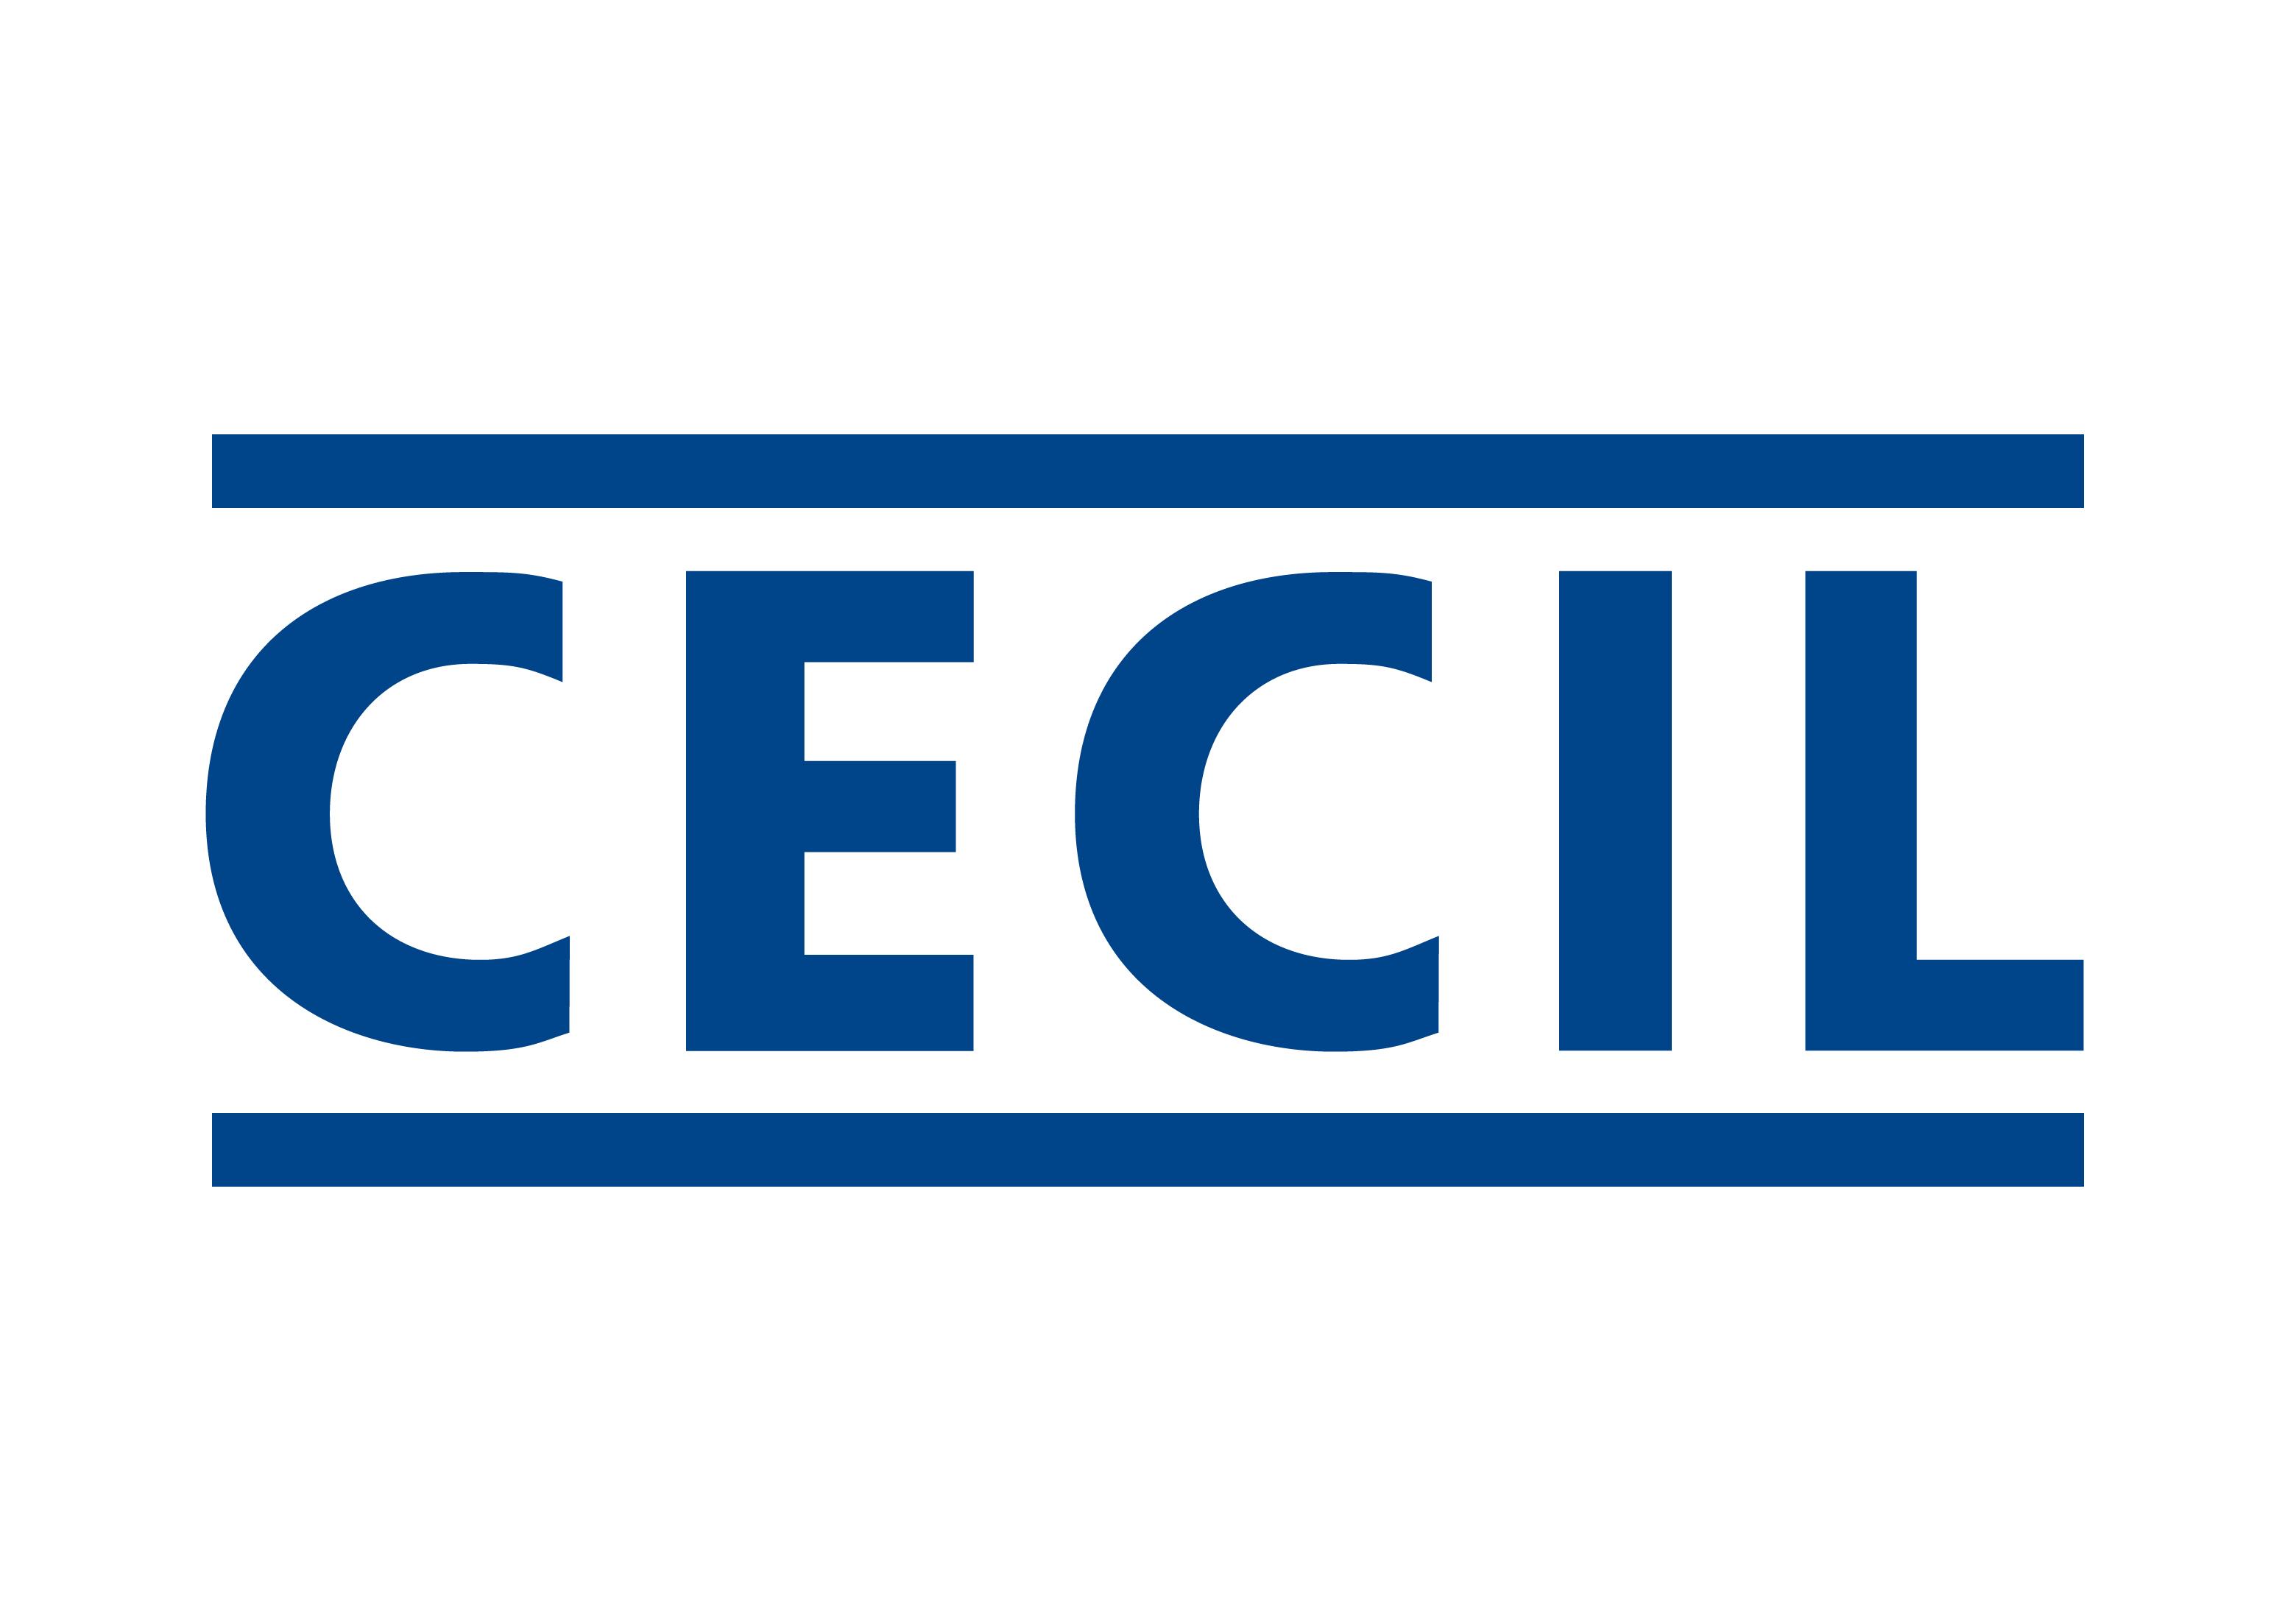 CECIL_logo.JPG